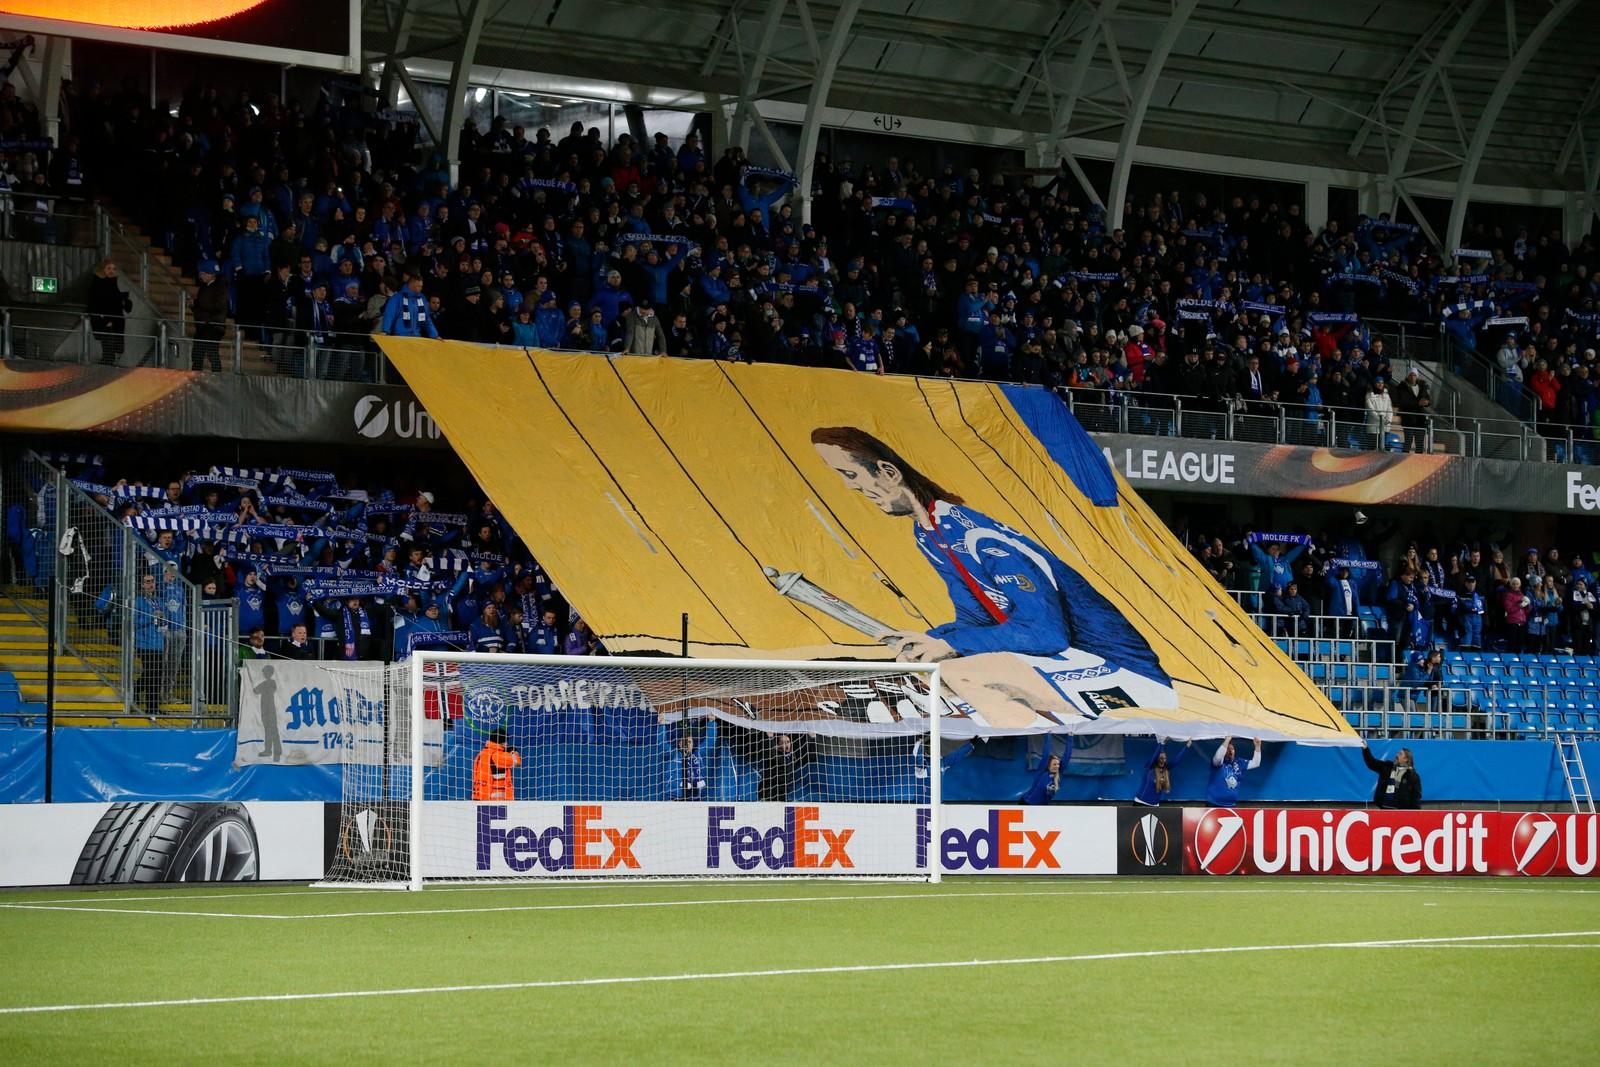 Molde 20160225. UEFA Europa League 2015/16: Molde - Sevilla. Europa League kampen mellom Molde og Sevilla på Aker Stadion. Foto: Svein Ove Ekornesvåg / NTB scanpix